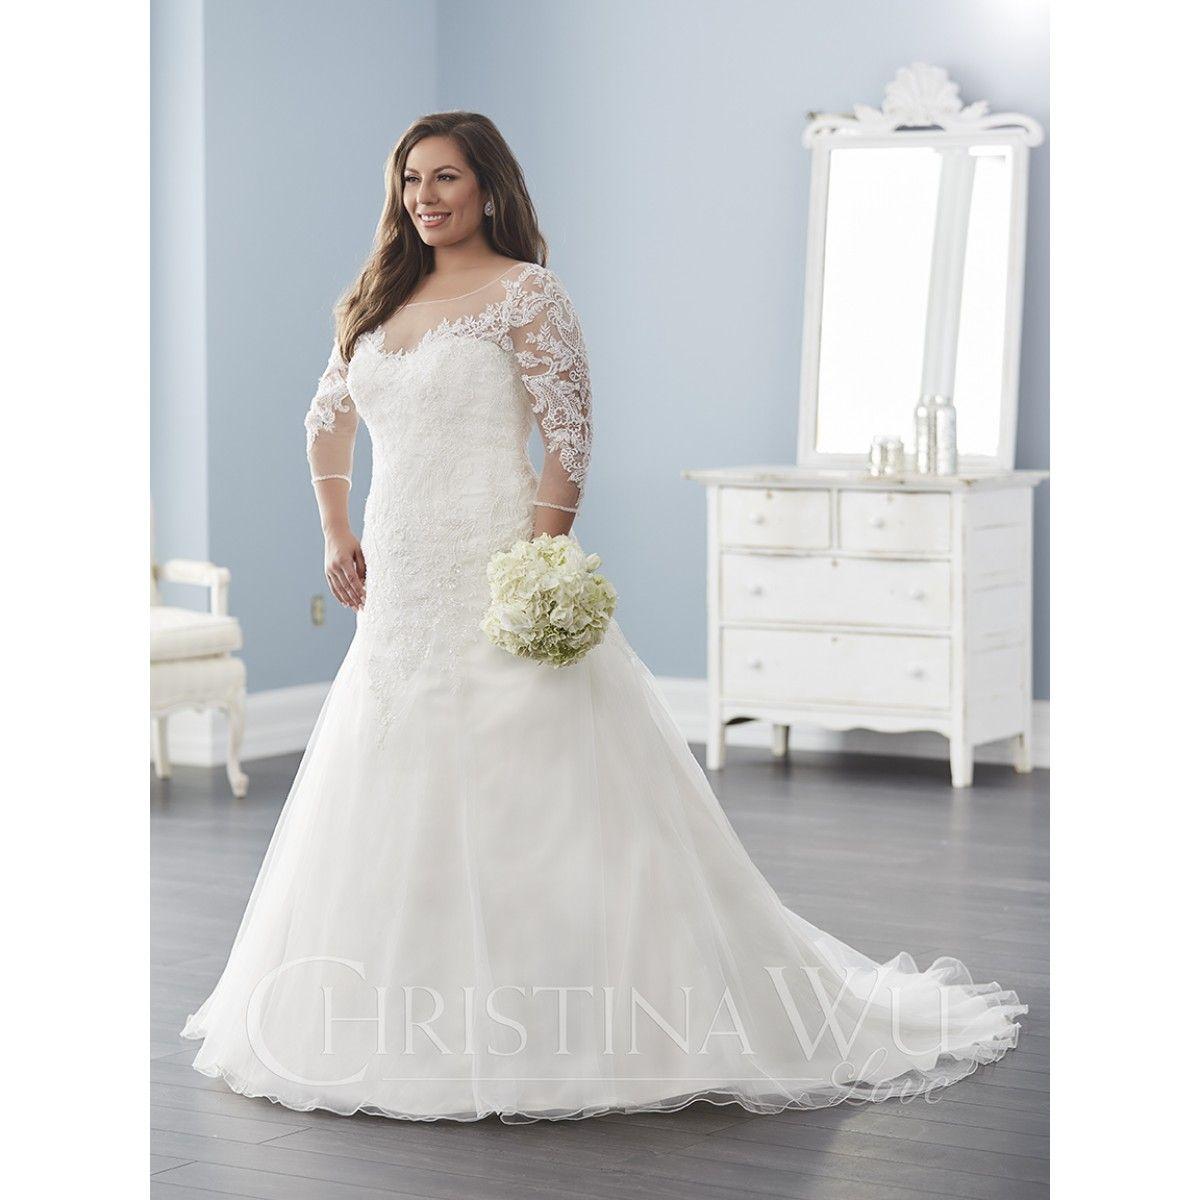 New style christina wu love dresses pinterest